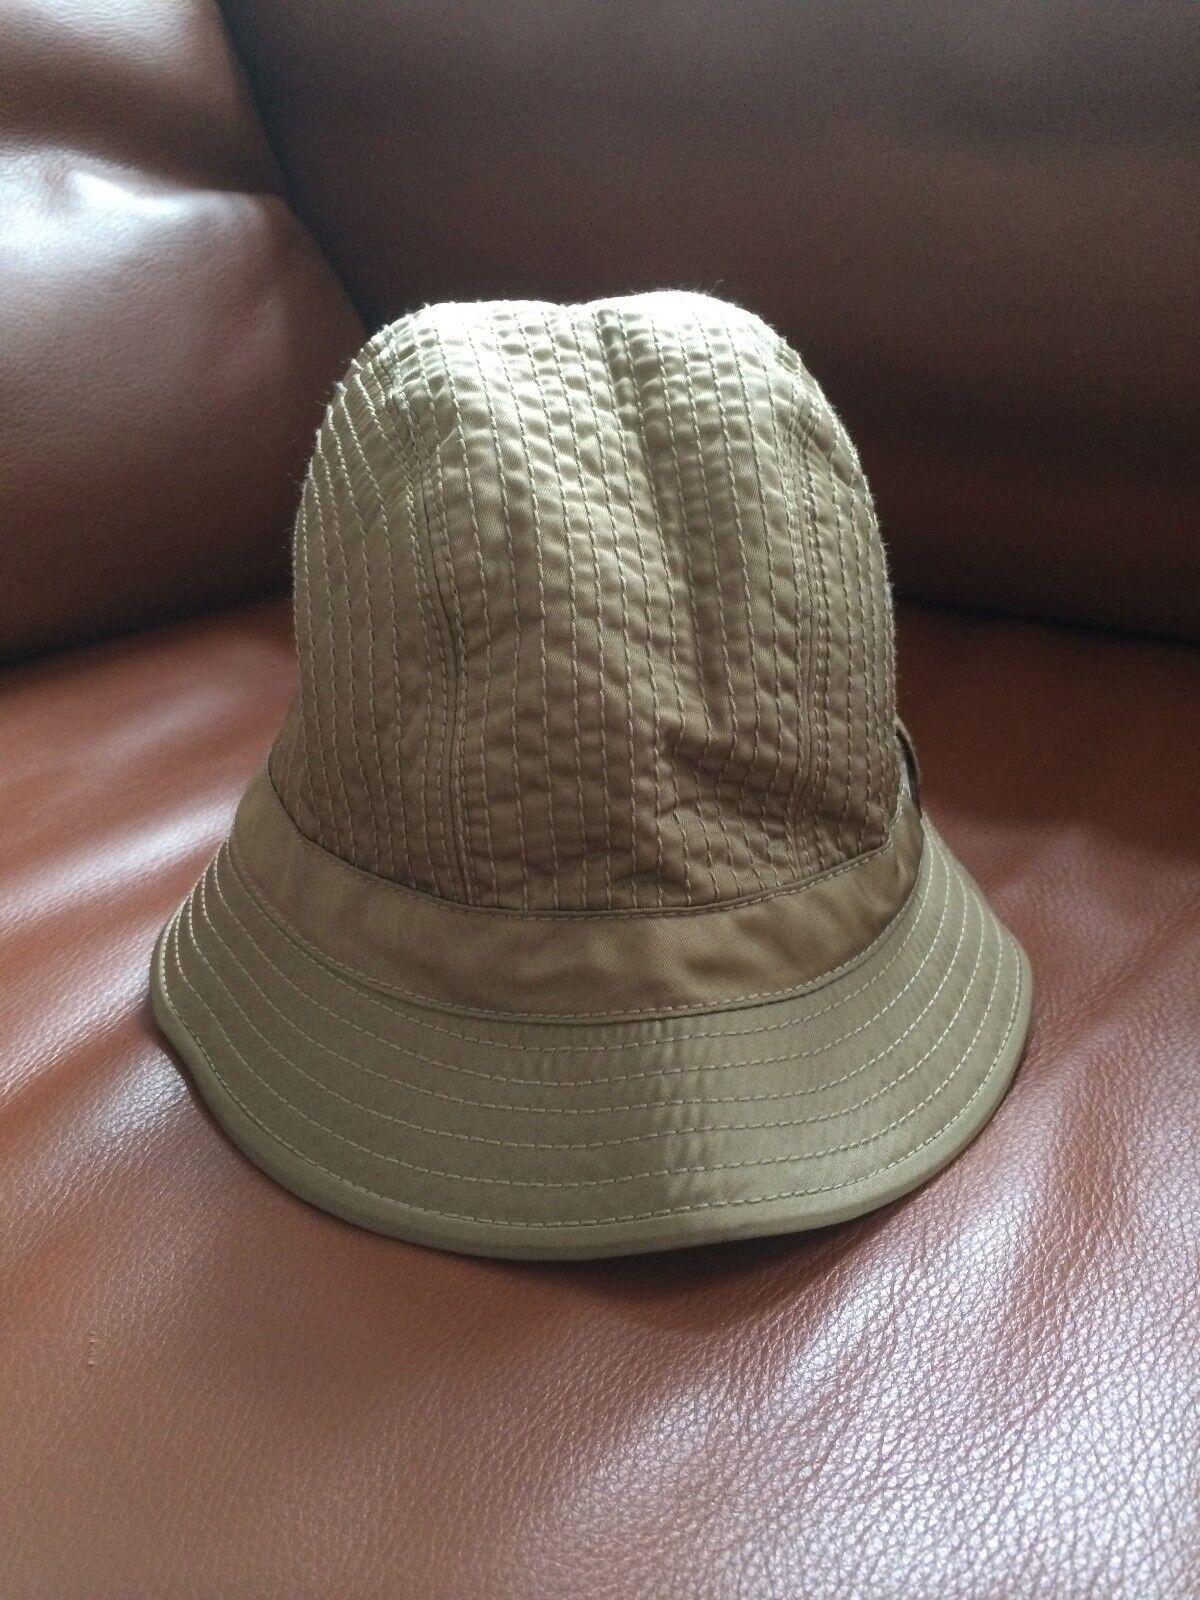 PRADA NYLON KAPPE BEIGE S HUT HAUBE MÜTZE CAP CAP CAP Gold OLIV BEIGE STEPP Gold | König der Quantität  | Creative  | Up-to-date-styling  903a13